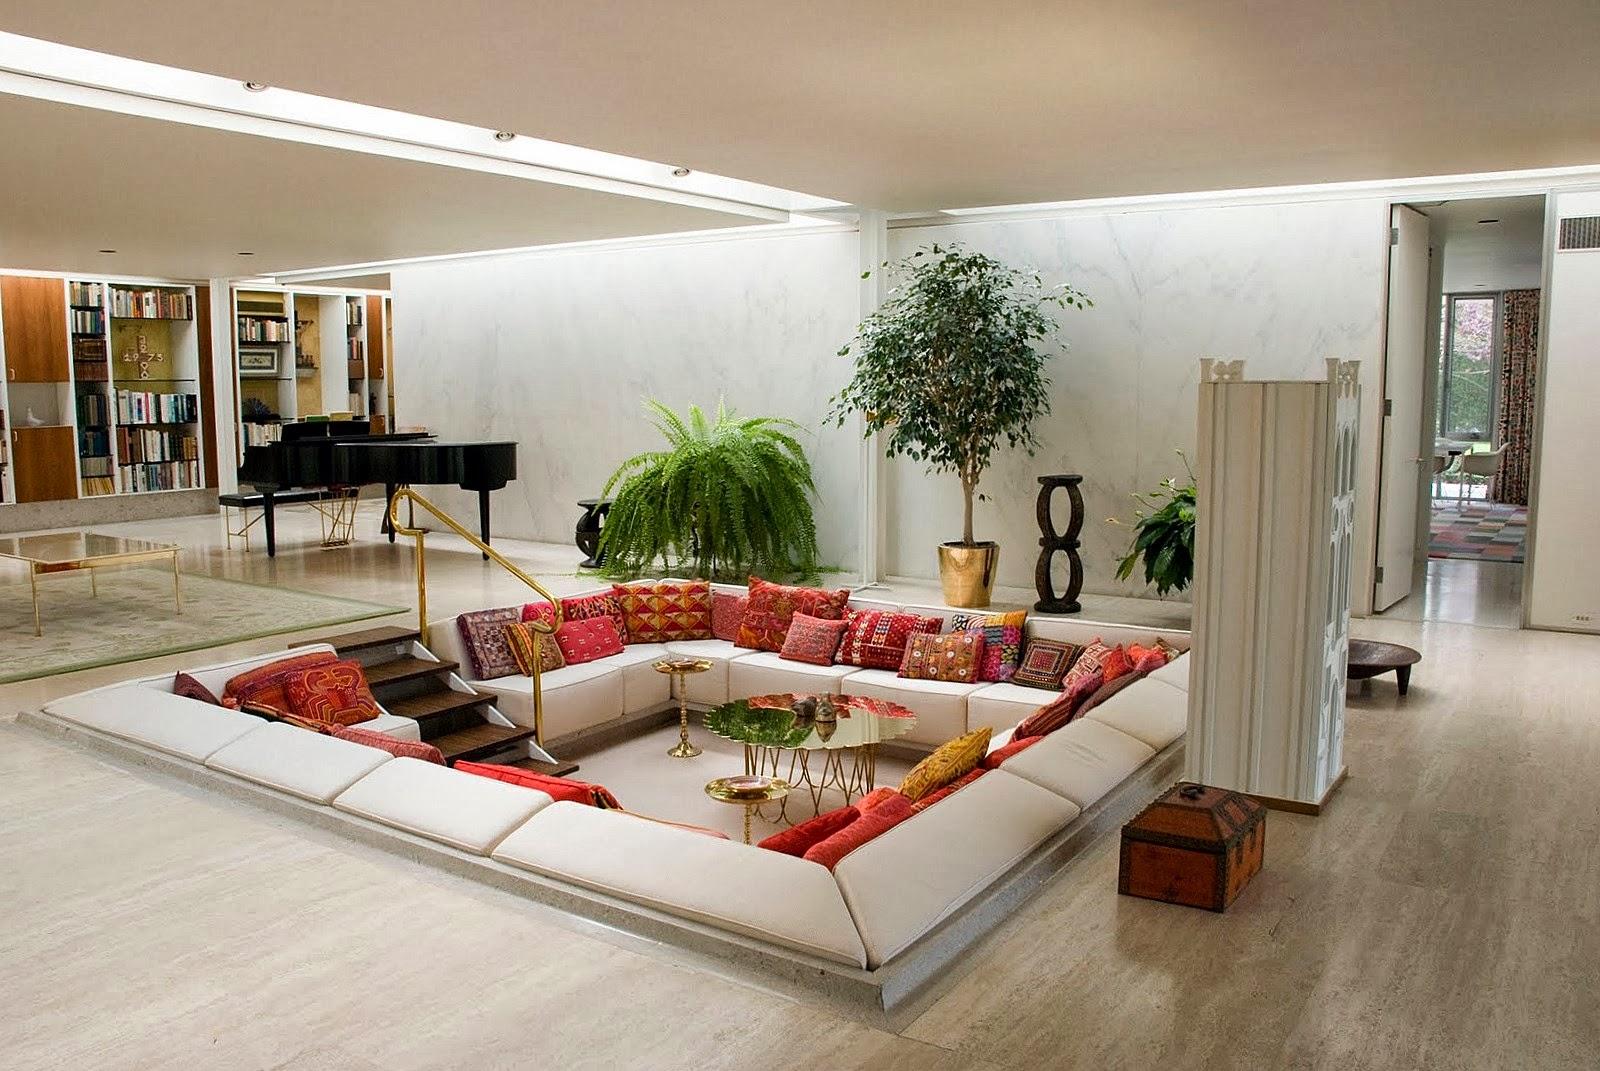 Amazing Furniture Small Living Room 450 Arrange Furniture Small Living Room